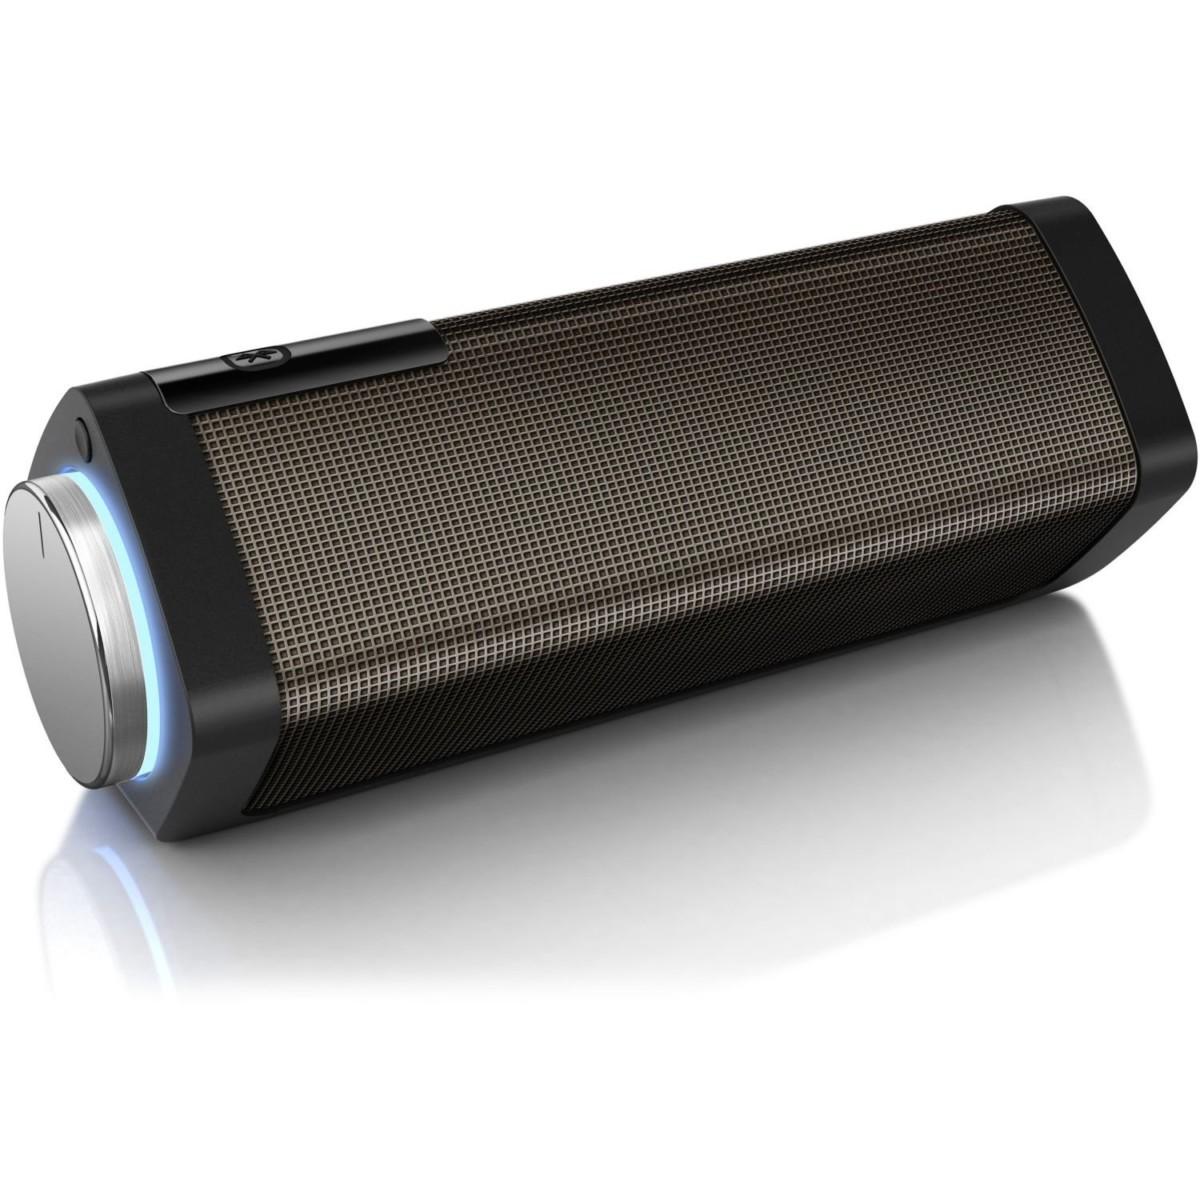 Philips BTS5000W/10 Enceintes stéréo sans fil Bluetooth Apt X AAC